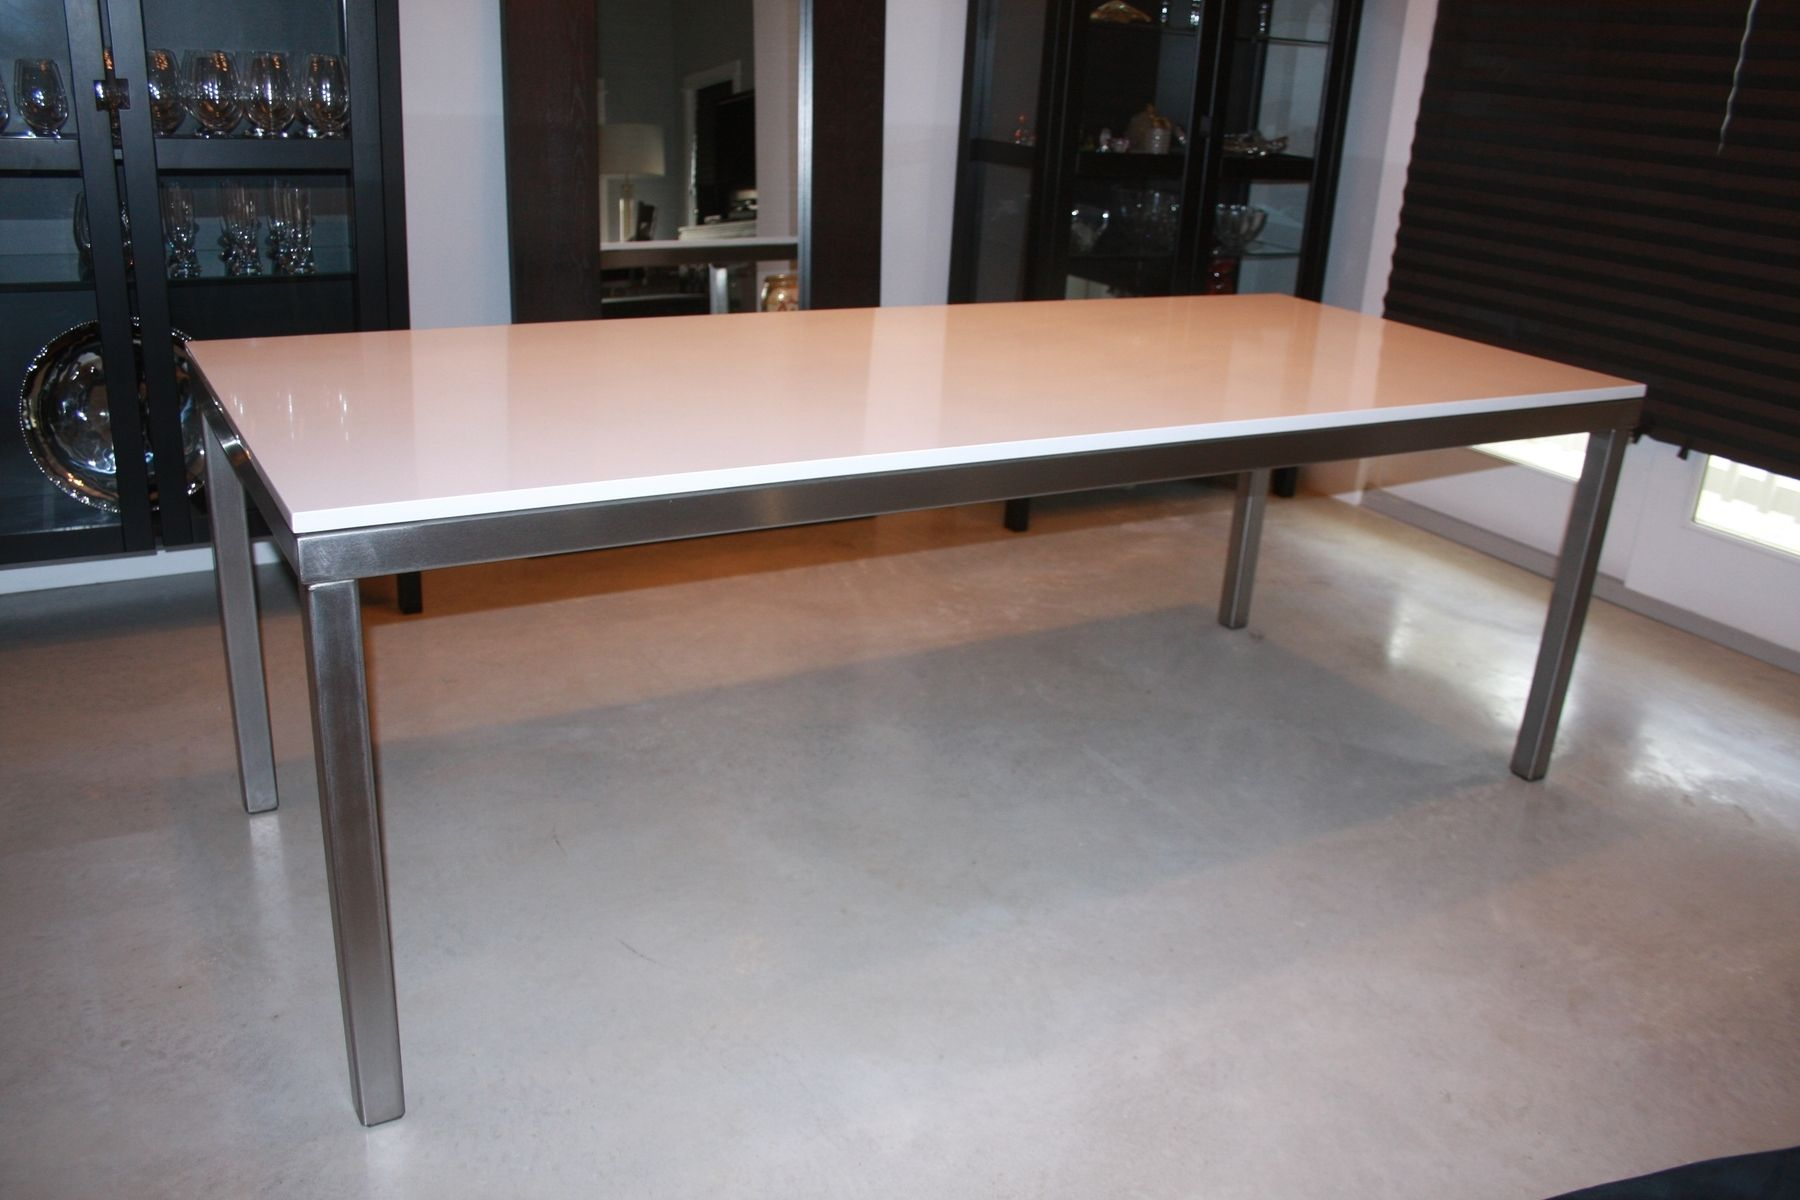 100 Steel Sofa In Bangalore Magasinsdusines Com  : 53621455744 from ll100proof.com size 1800 x 1200 jpeg 157kB